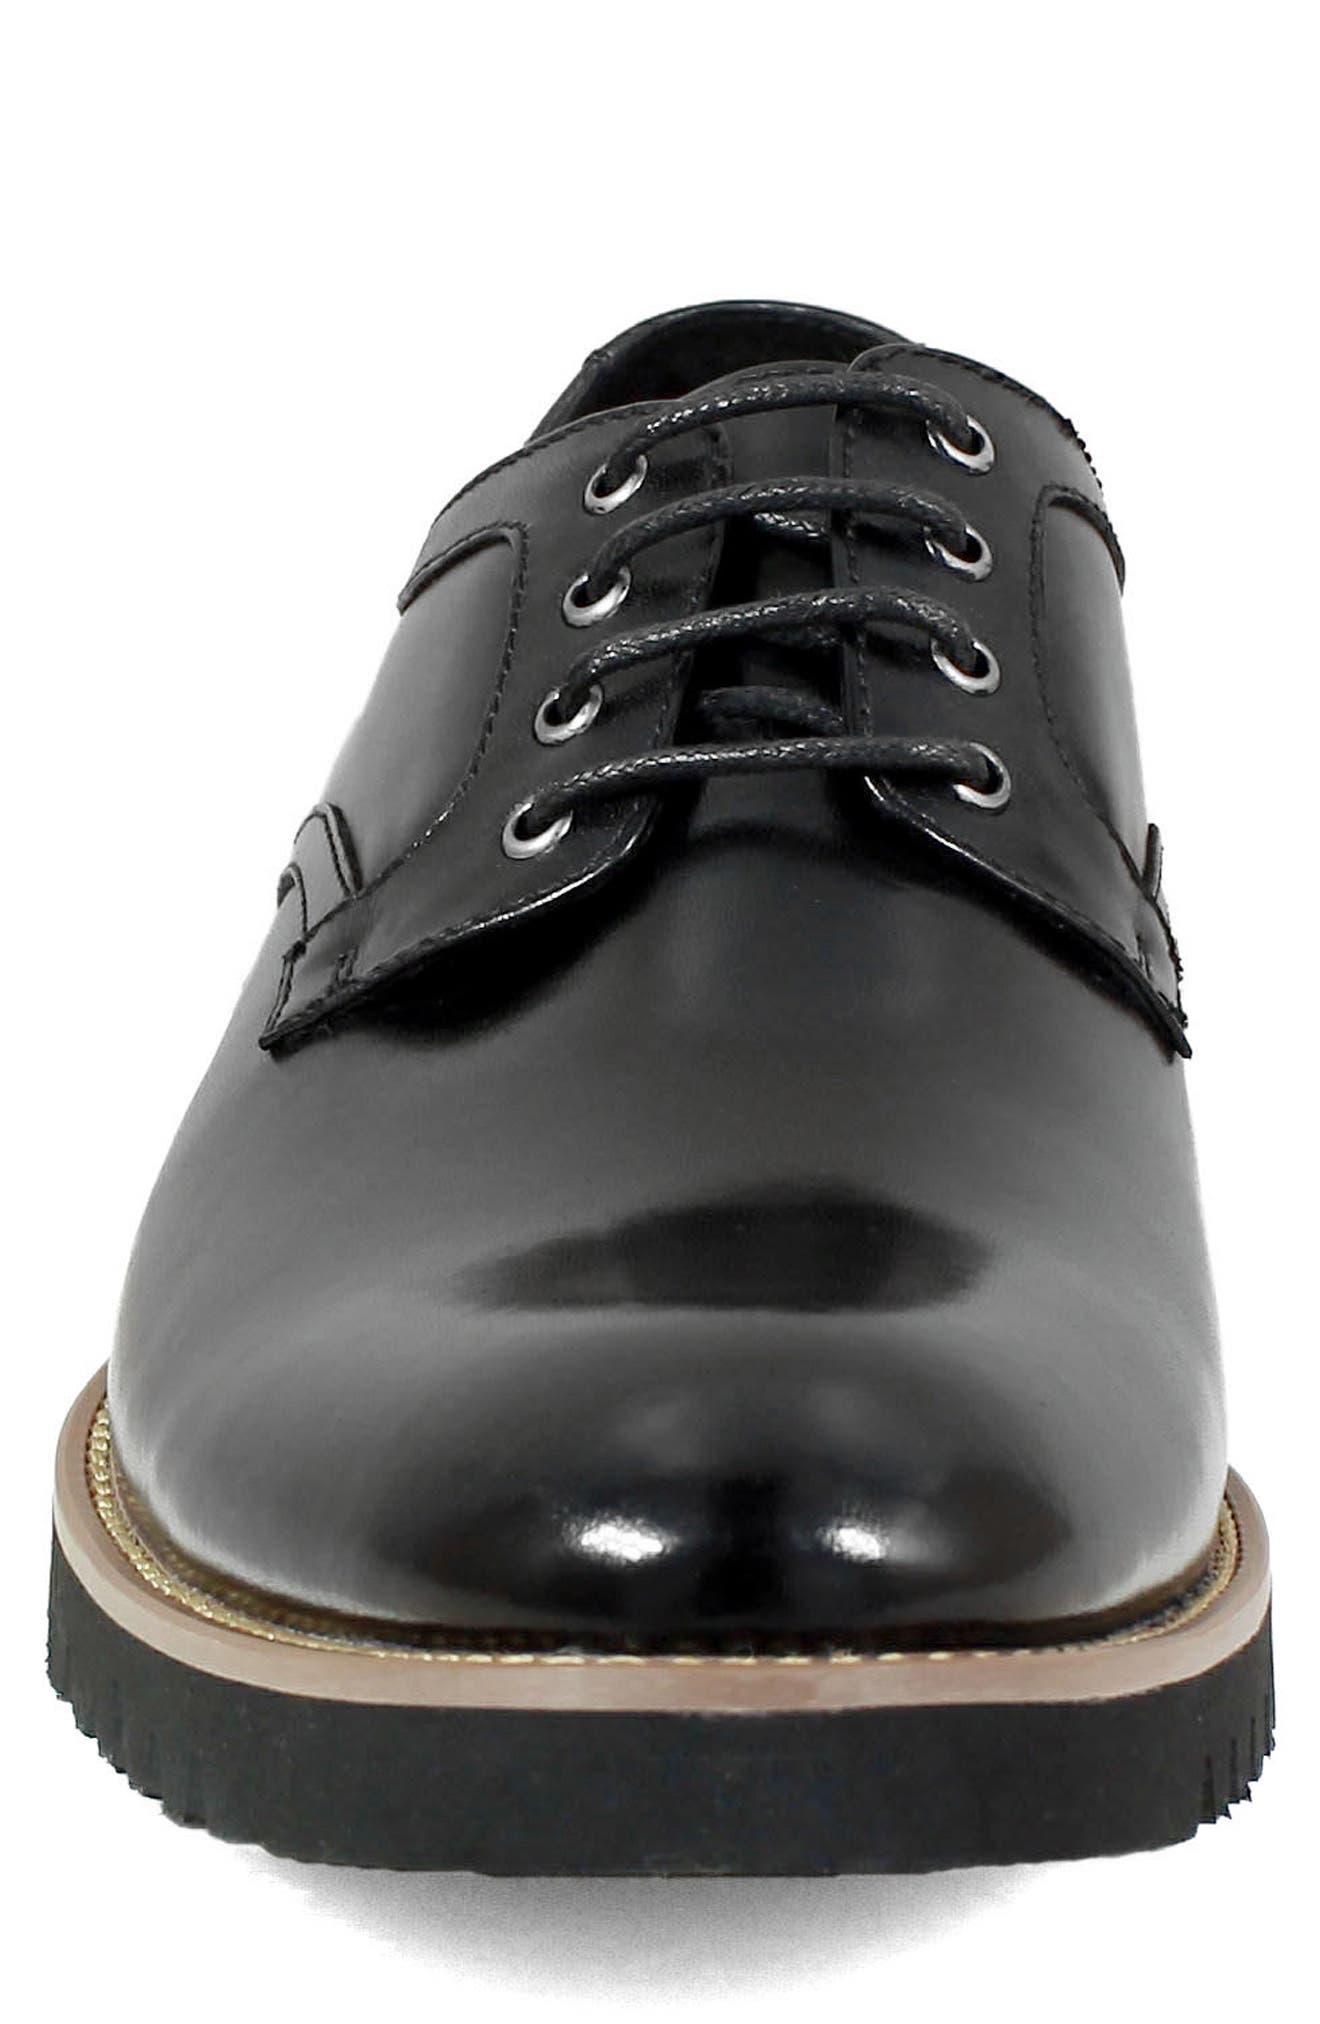 Barclay Plain Toe Derby,                             Alternate thumbnail 4, color,                             BLACK LEATHER